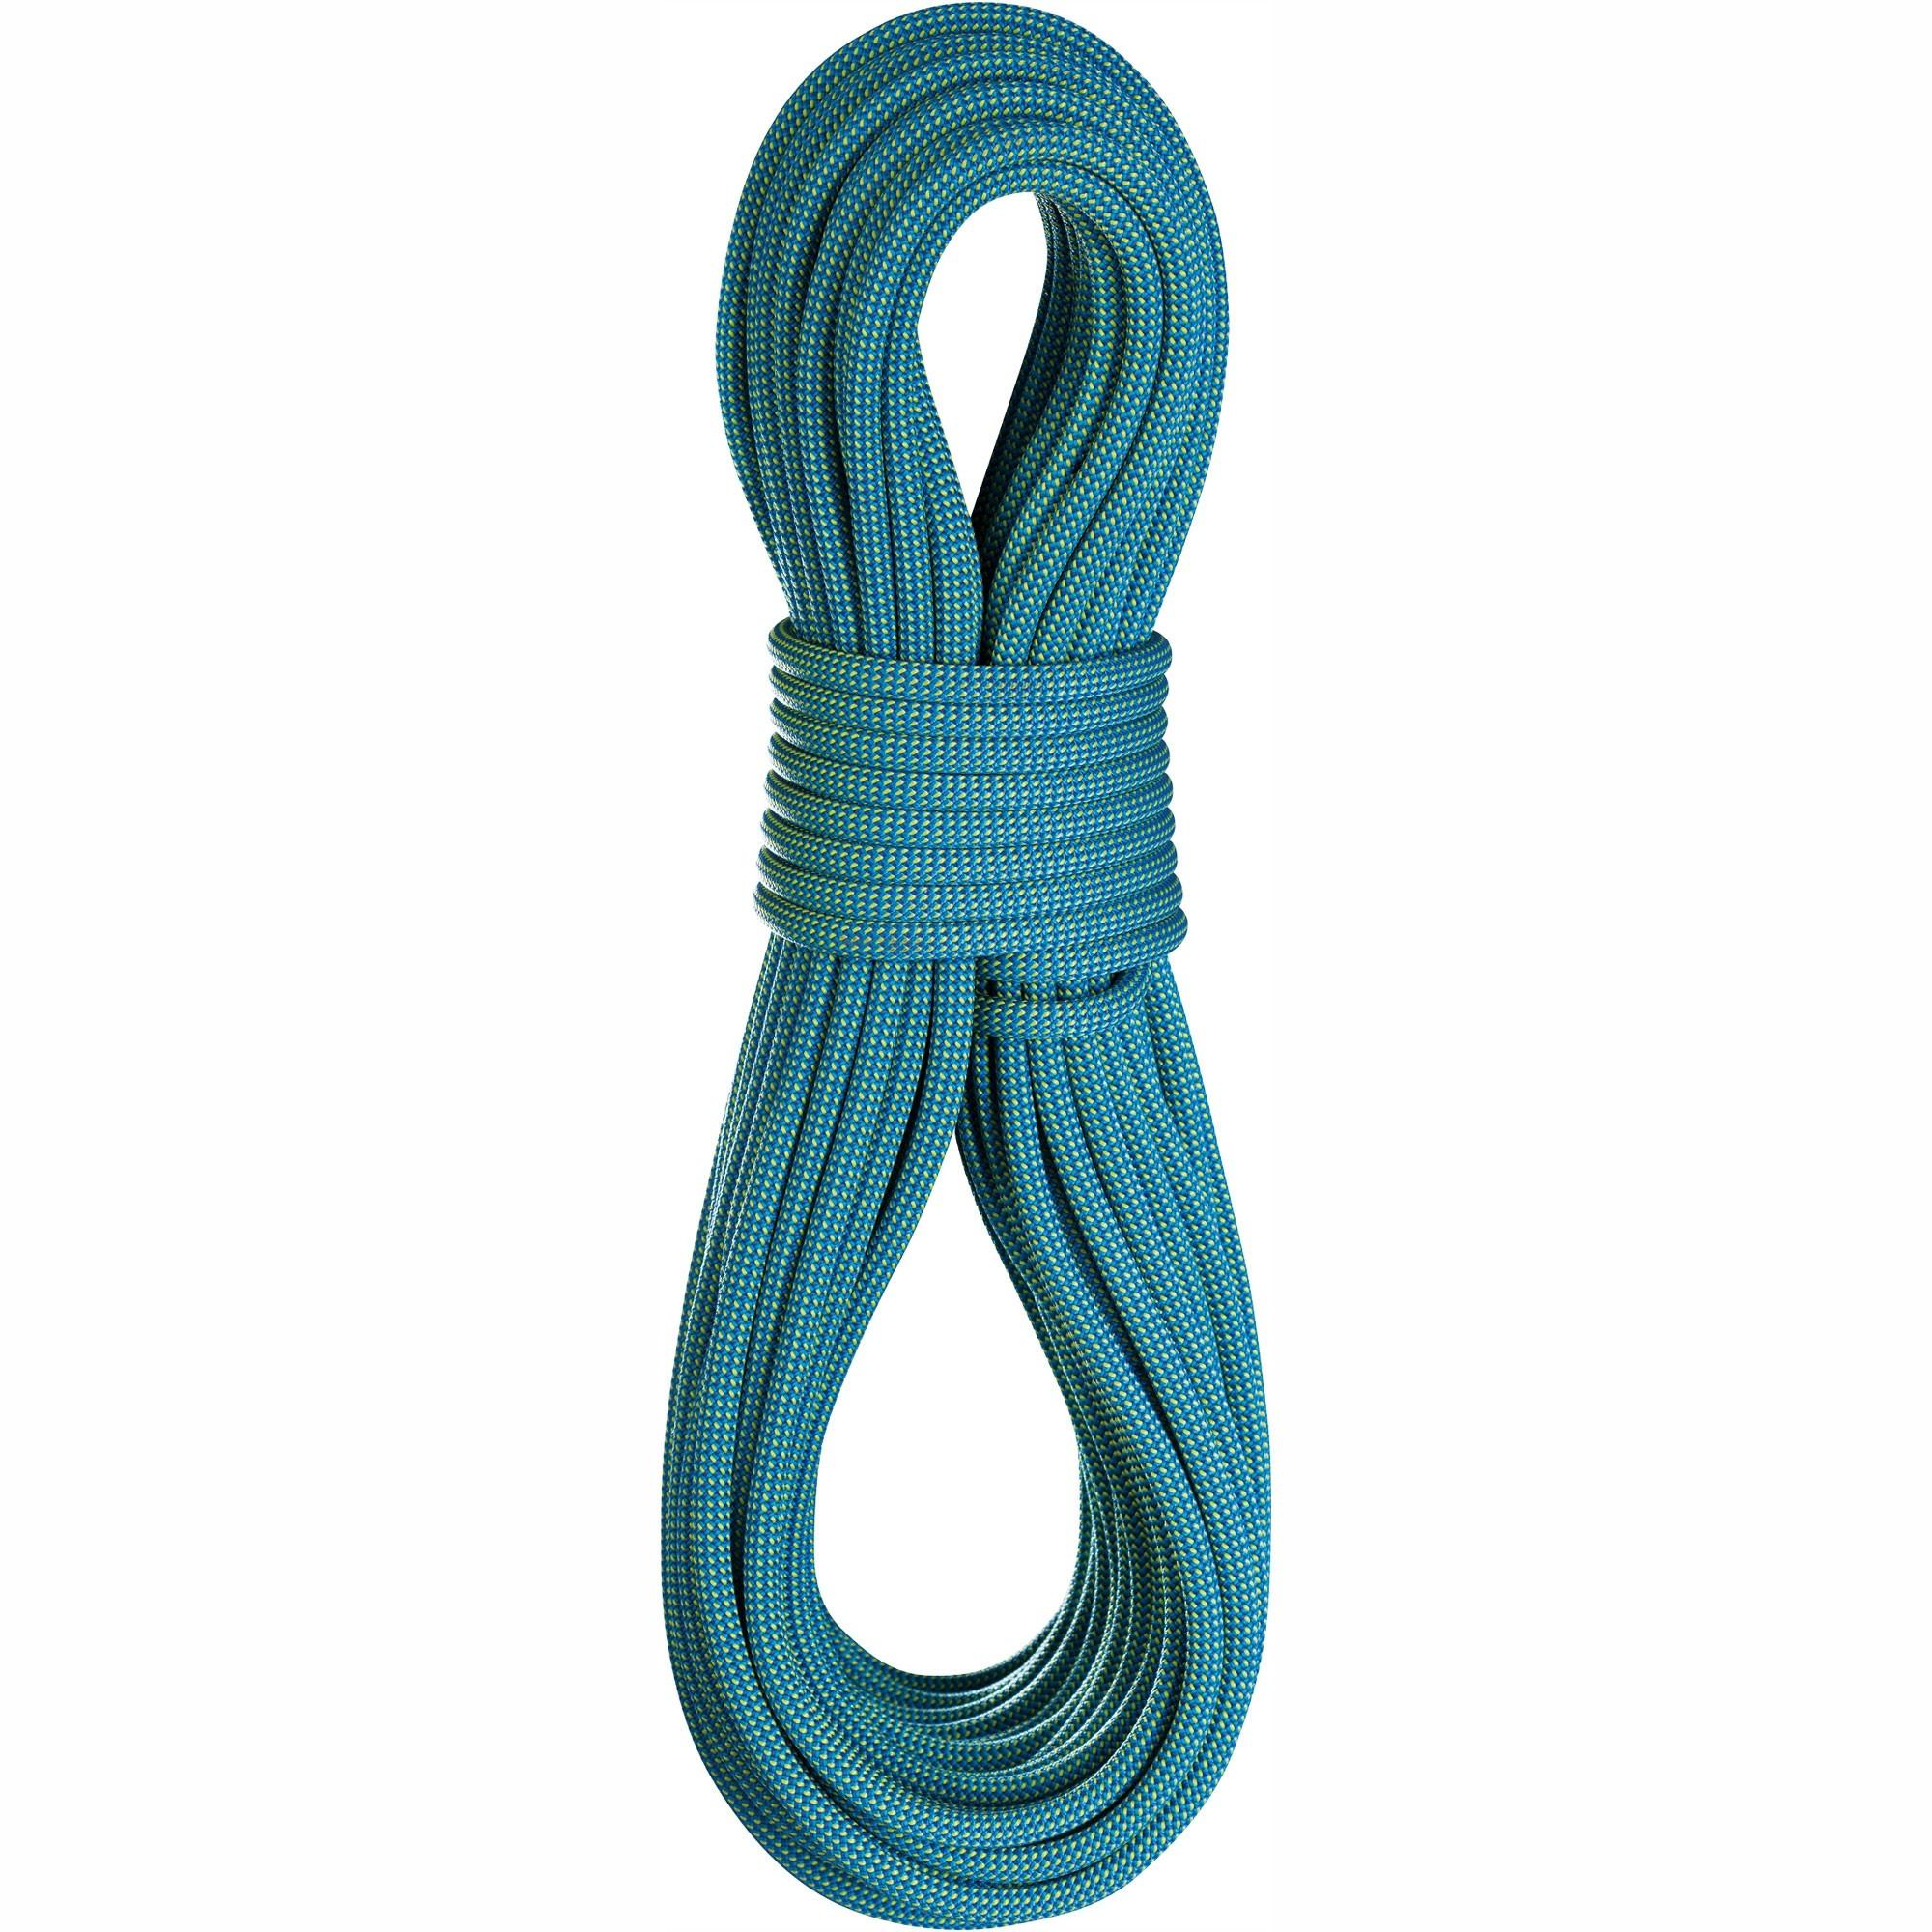 Edelrid Kestrel Pro Dry 8.5mm 50m Half Rope - Aqua/Oasis